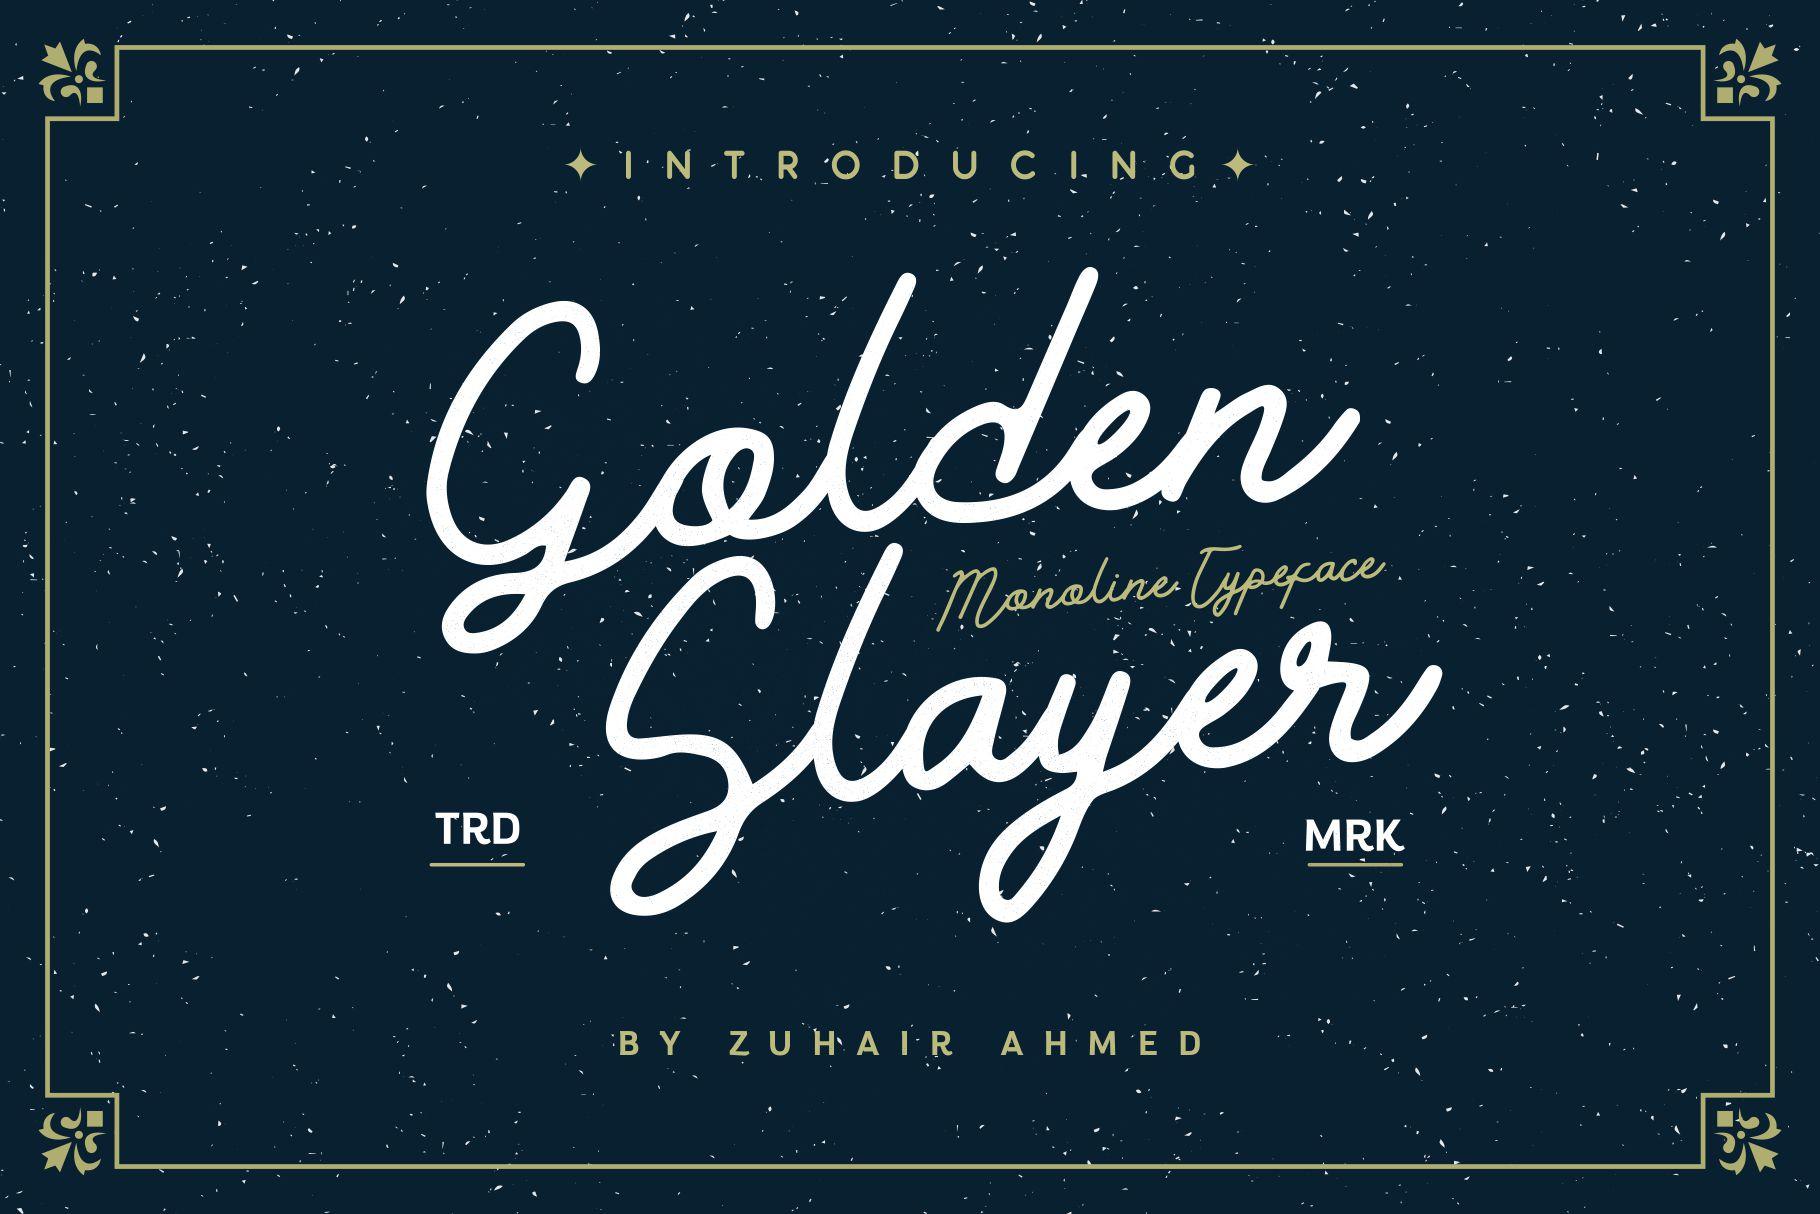 Golden Slayer - Monoline Typeface example image 1